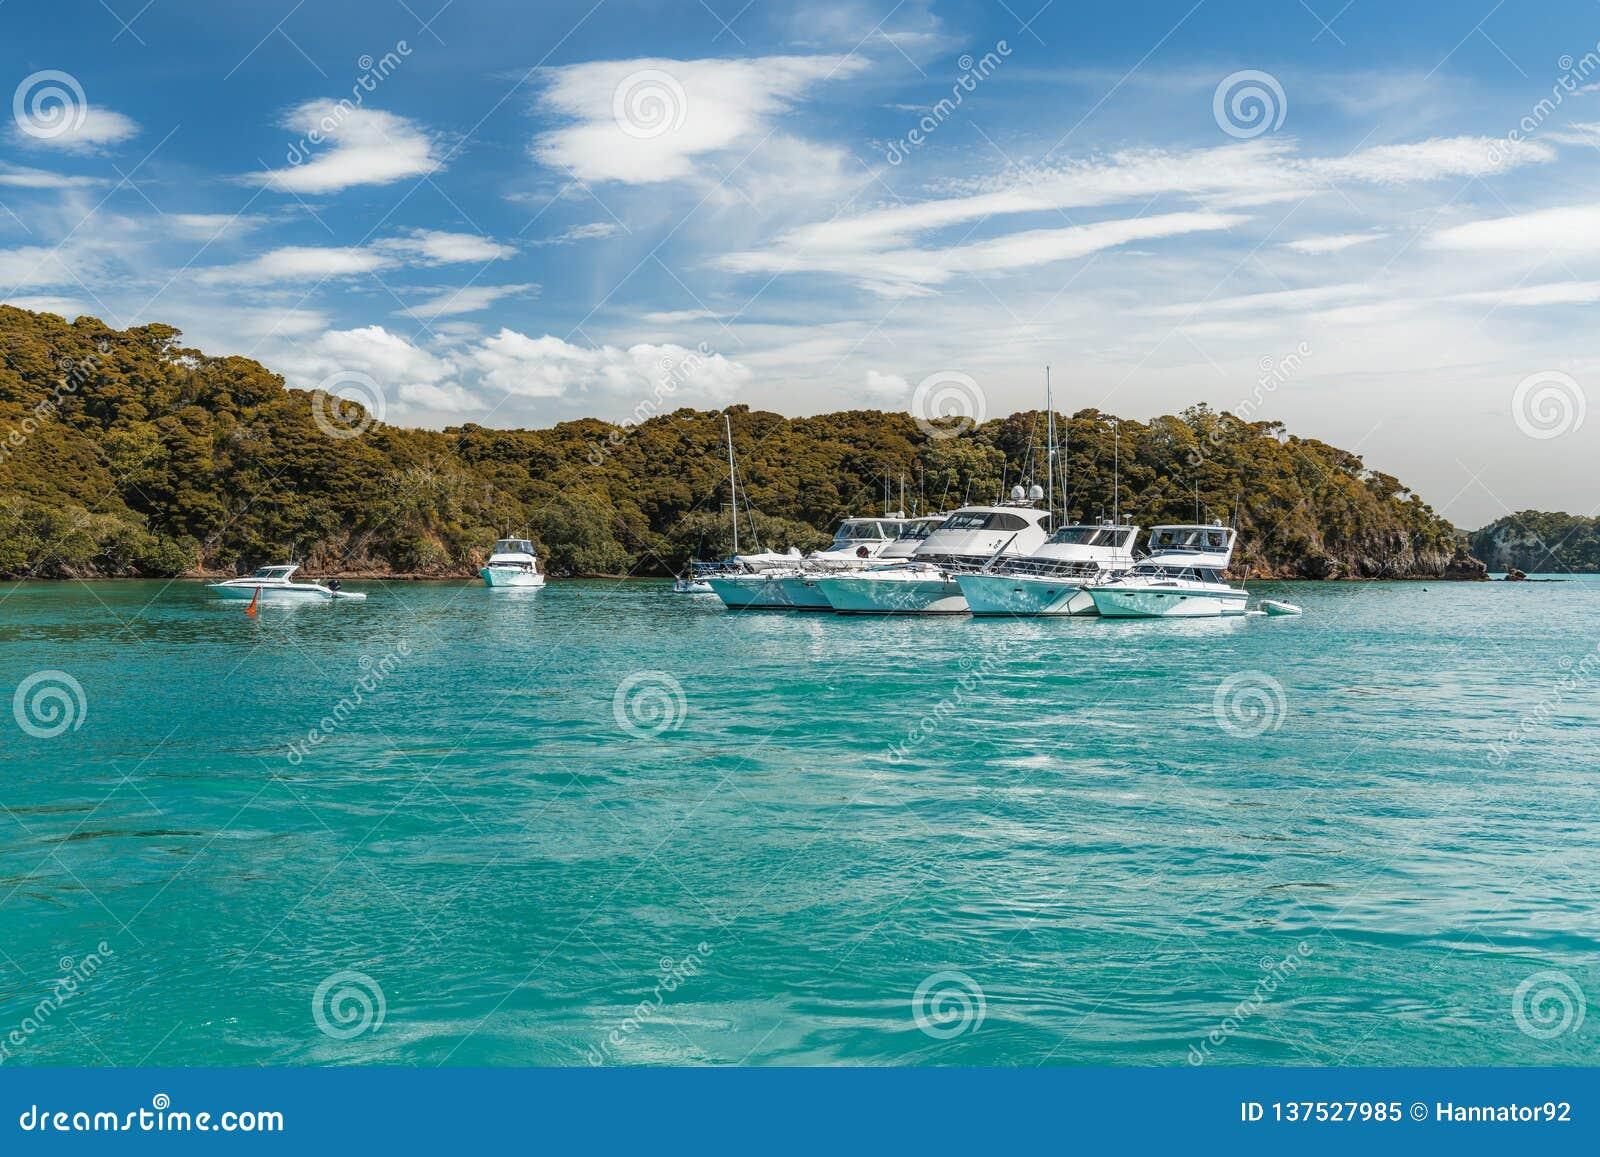 Luxury yachts docked in sea